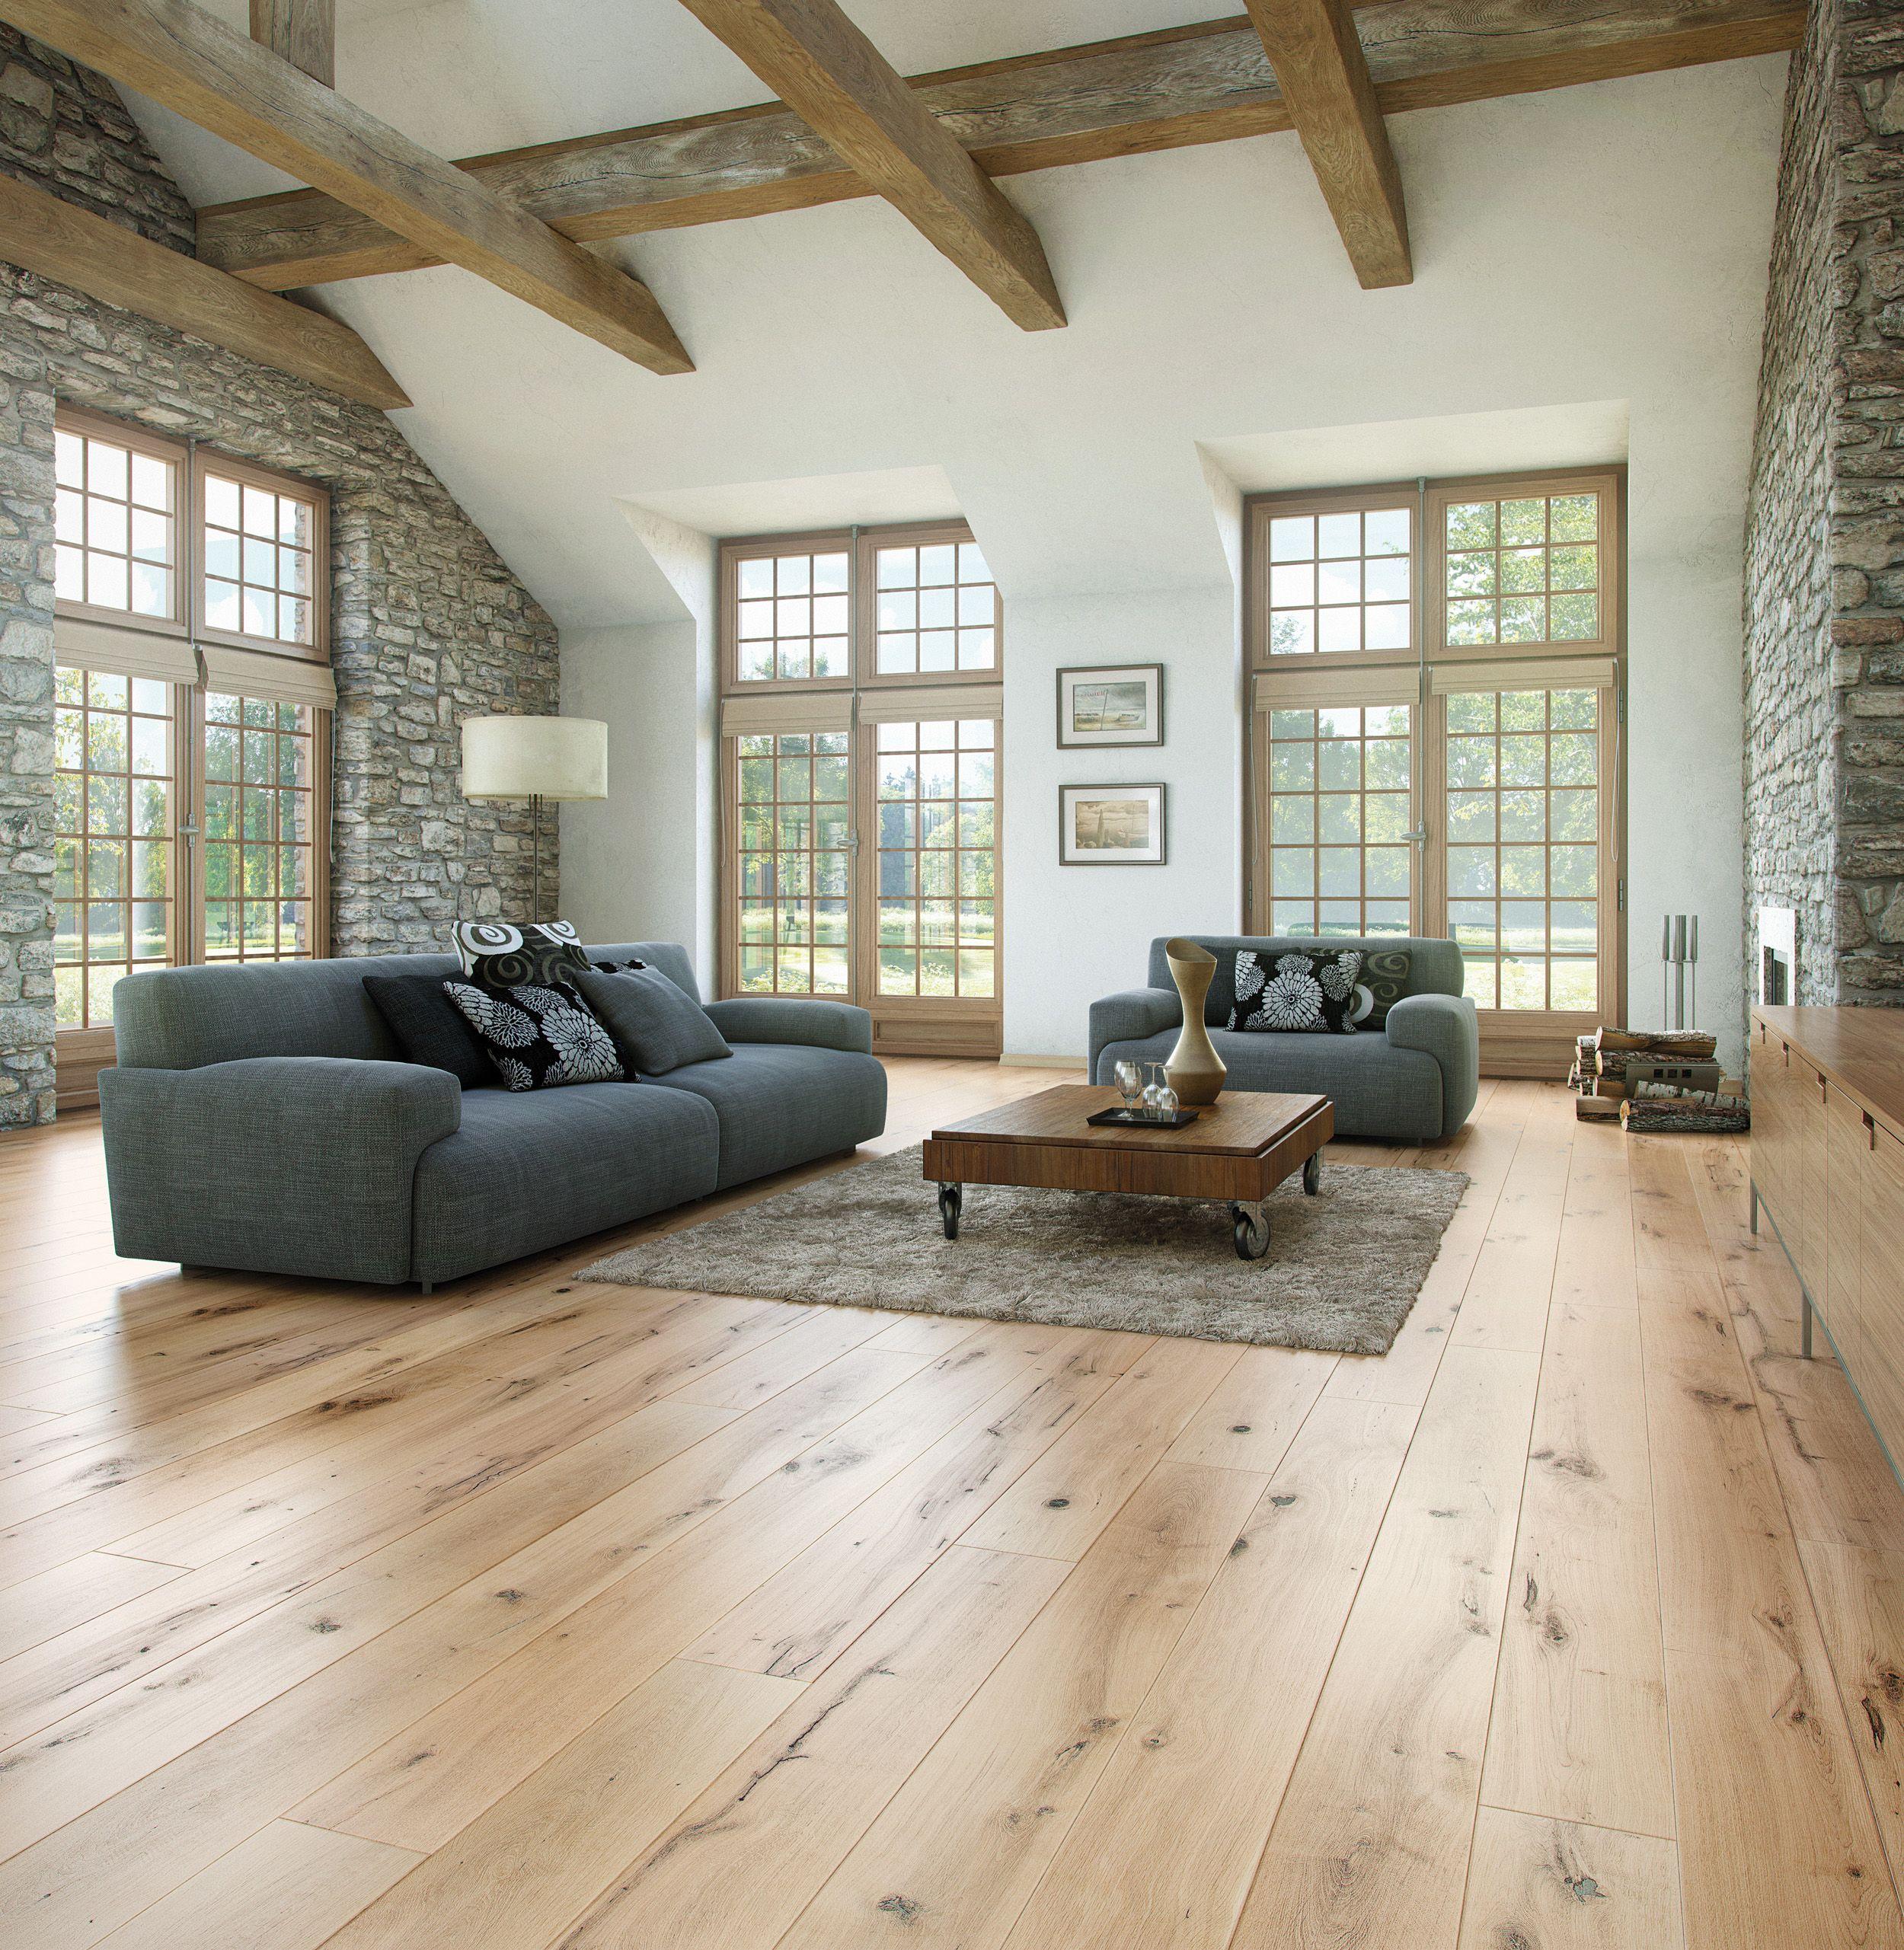 5g0441 i do parkett landhausdiele xl eiche kernig portato 4v gefast geb rstet weiss natur ge lt. Black Bedroom Furniture Sets. Home Design Ideas